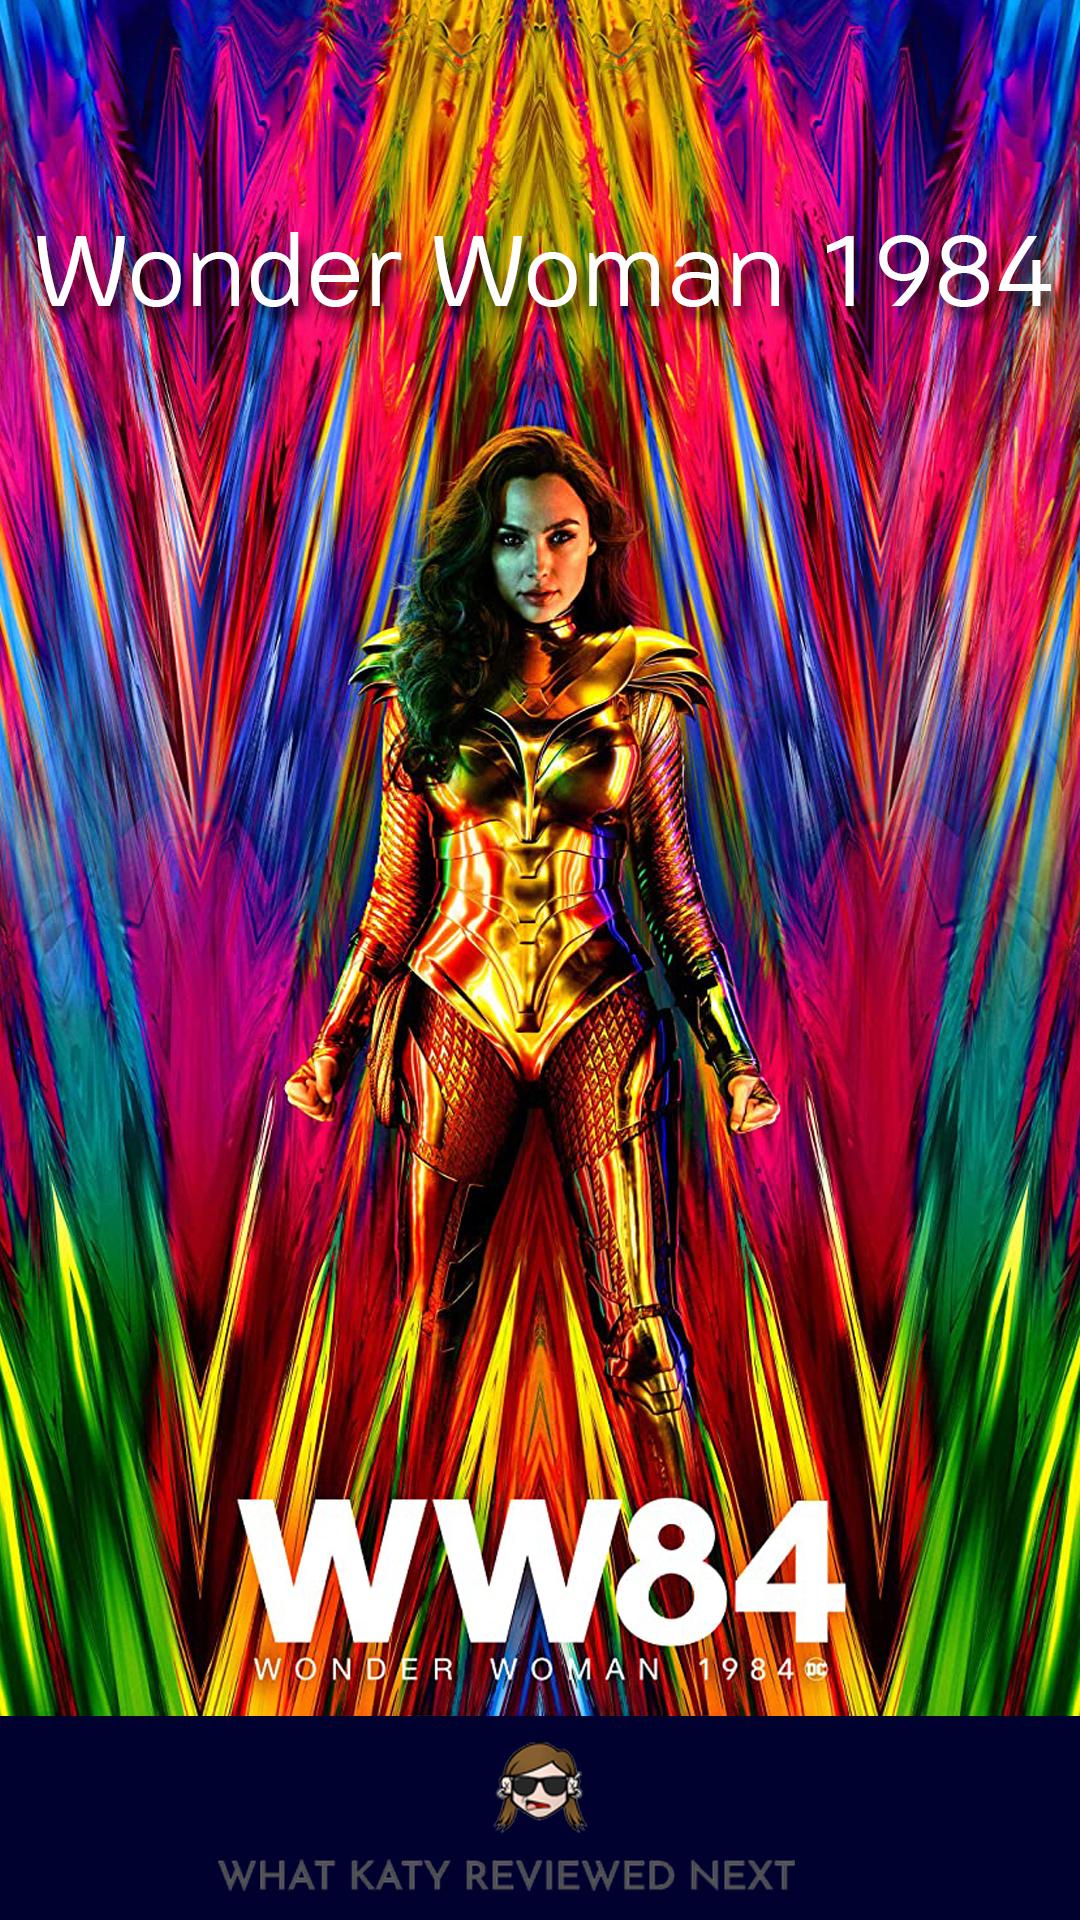 Wonder Woman 1984 Film Review